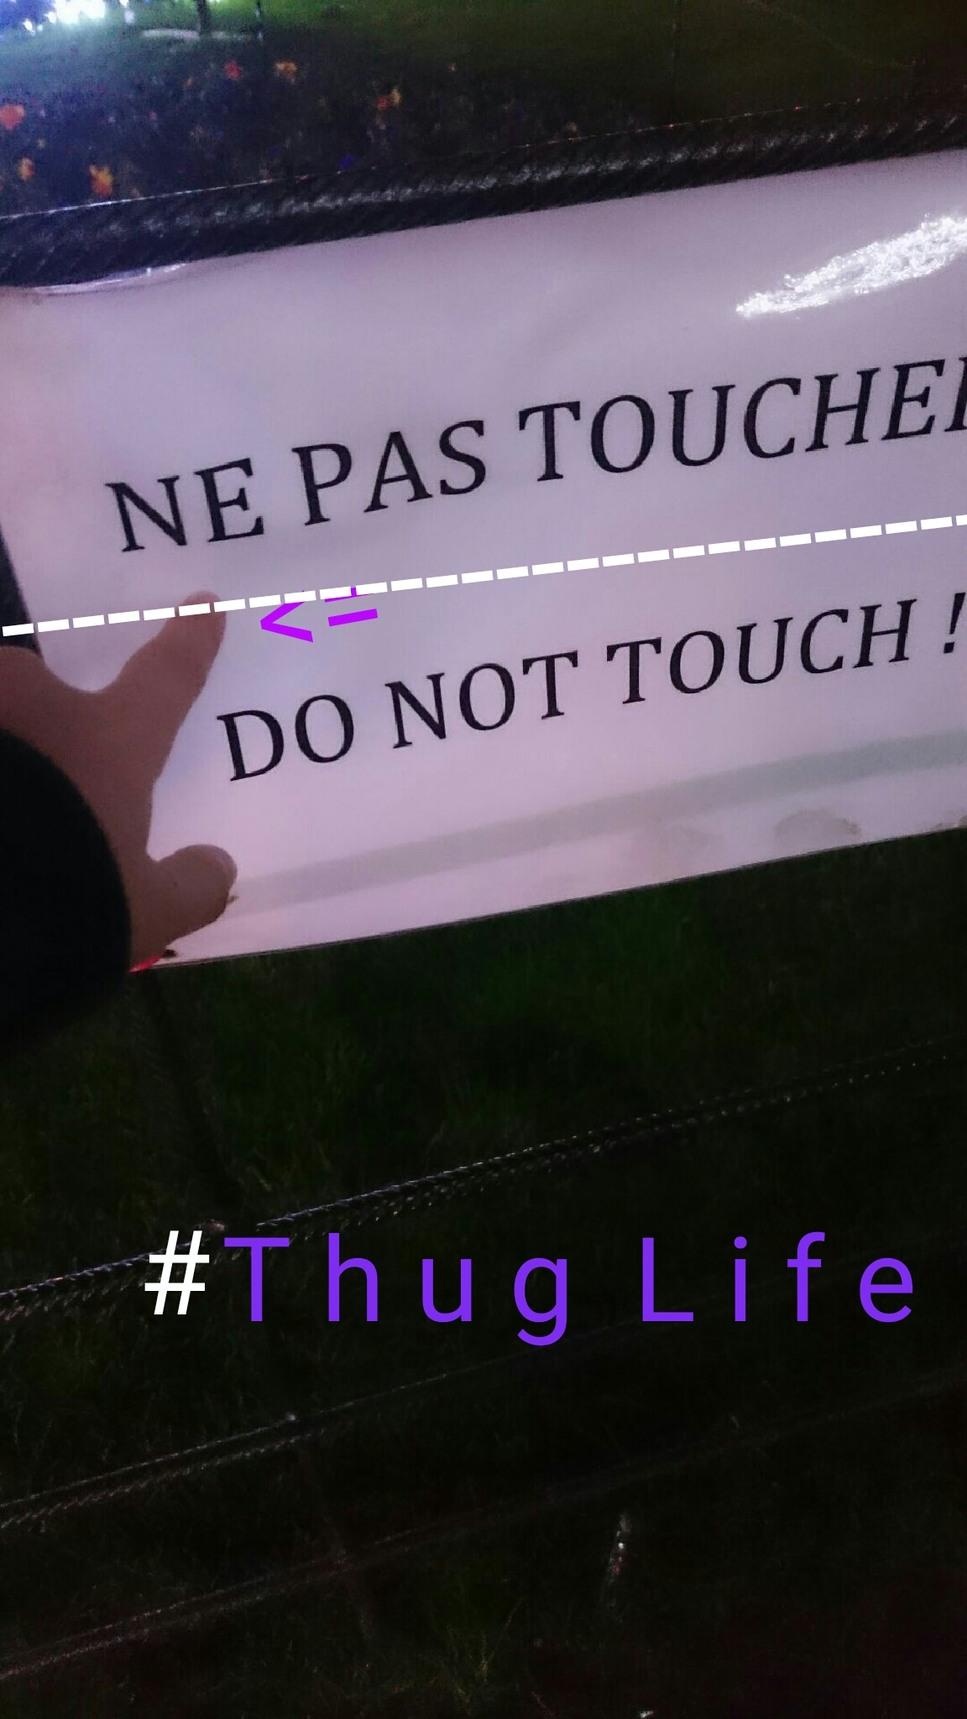 Thug Life #1 - meme